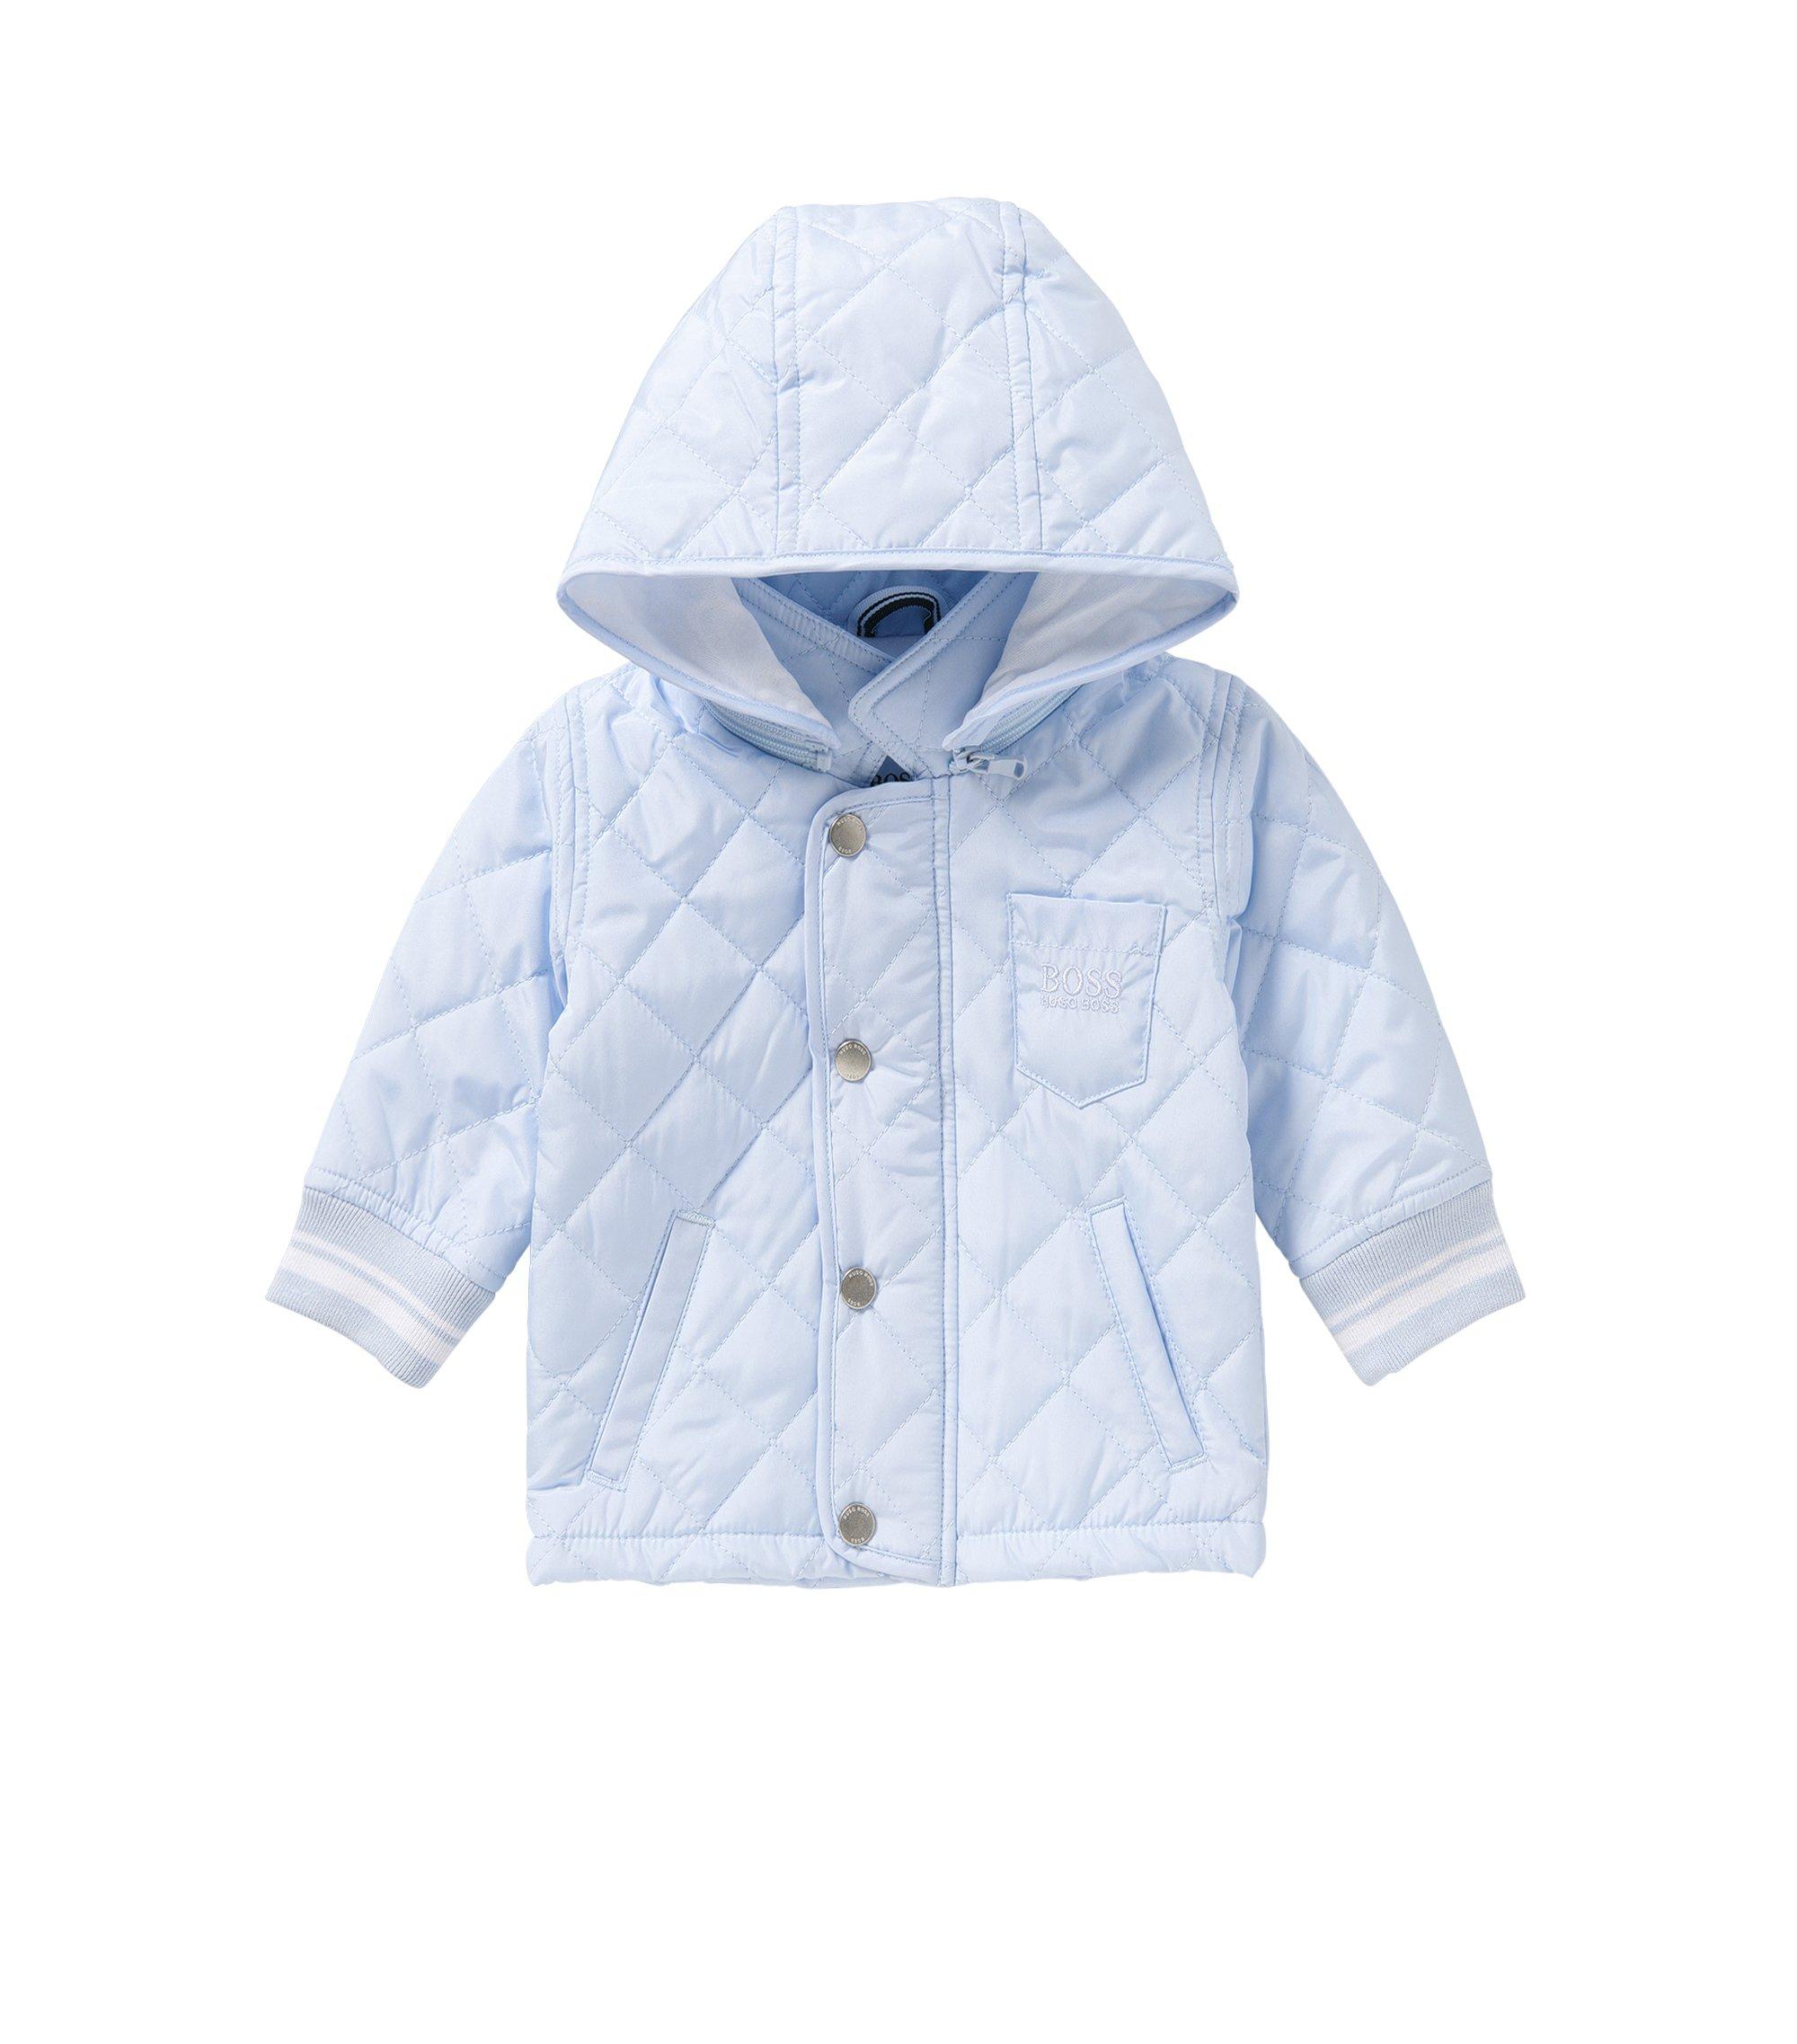 Baby-Steppjacke mit abnehmbarer Kapuze: 'J96056', Hellblau